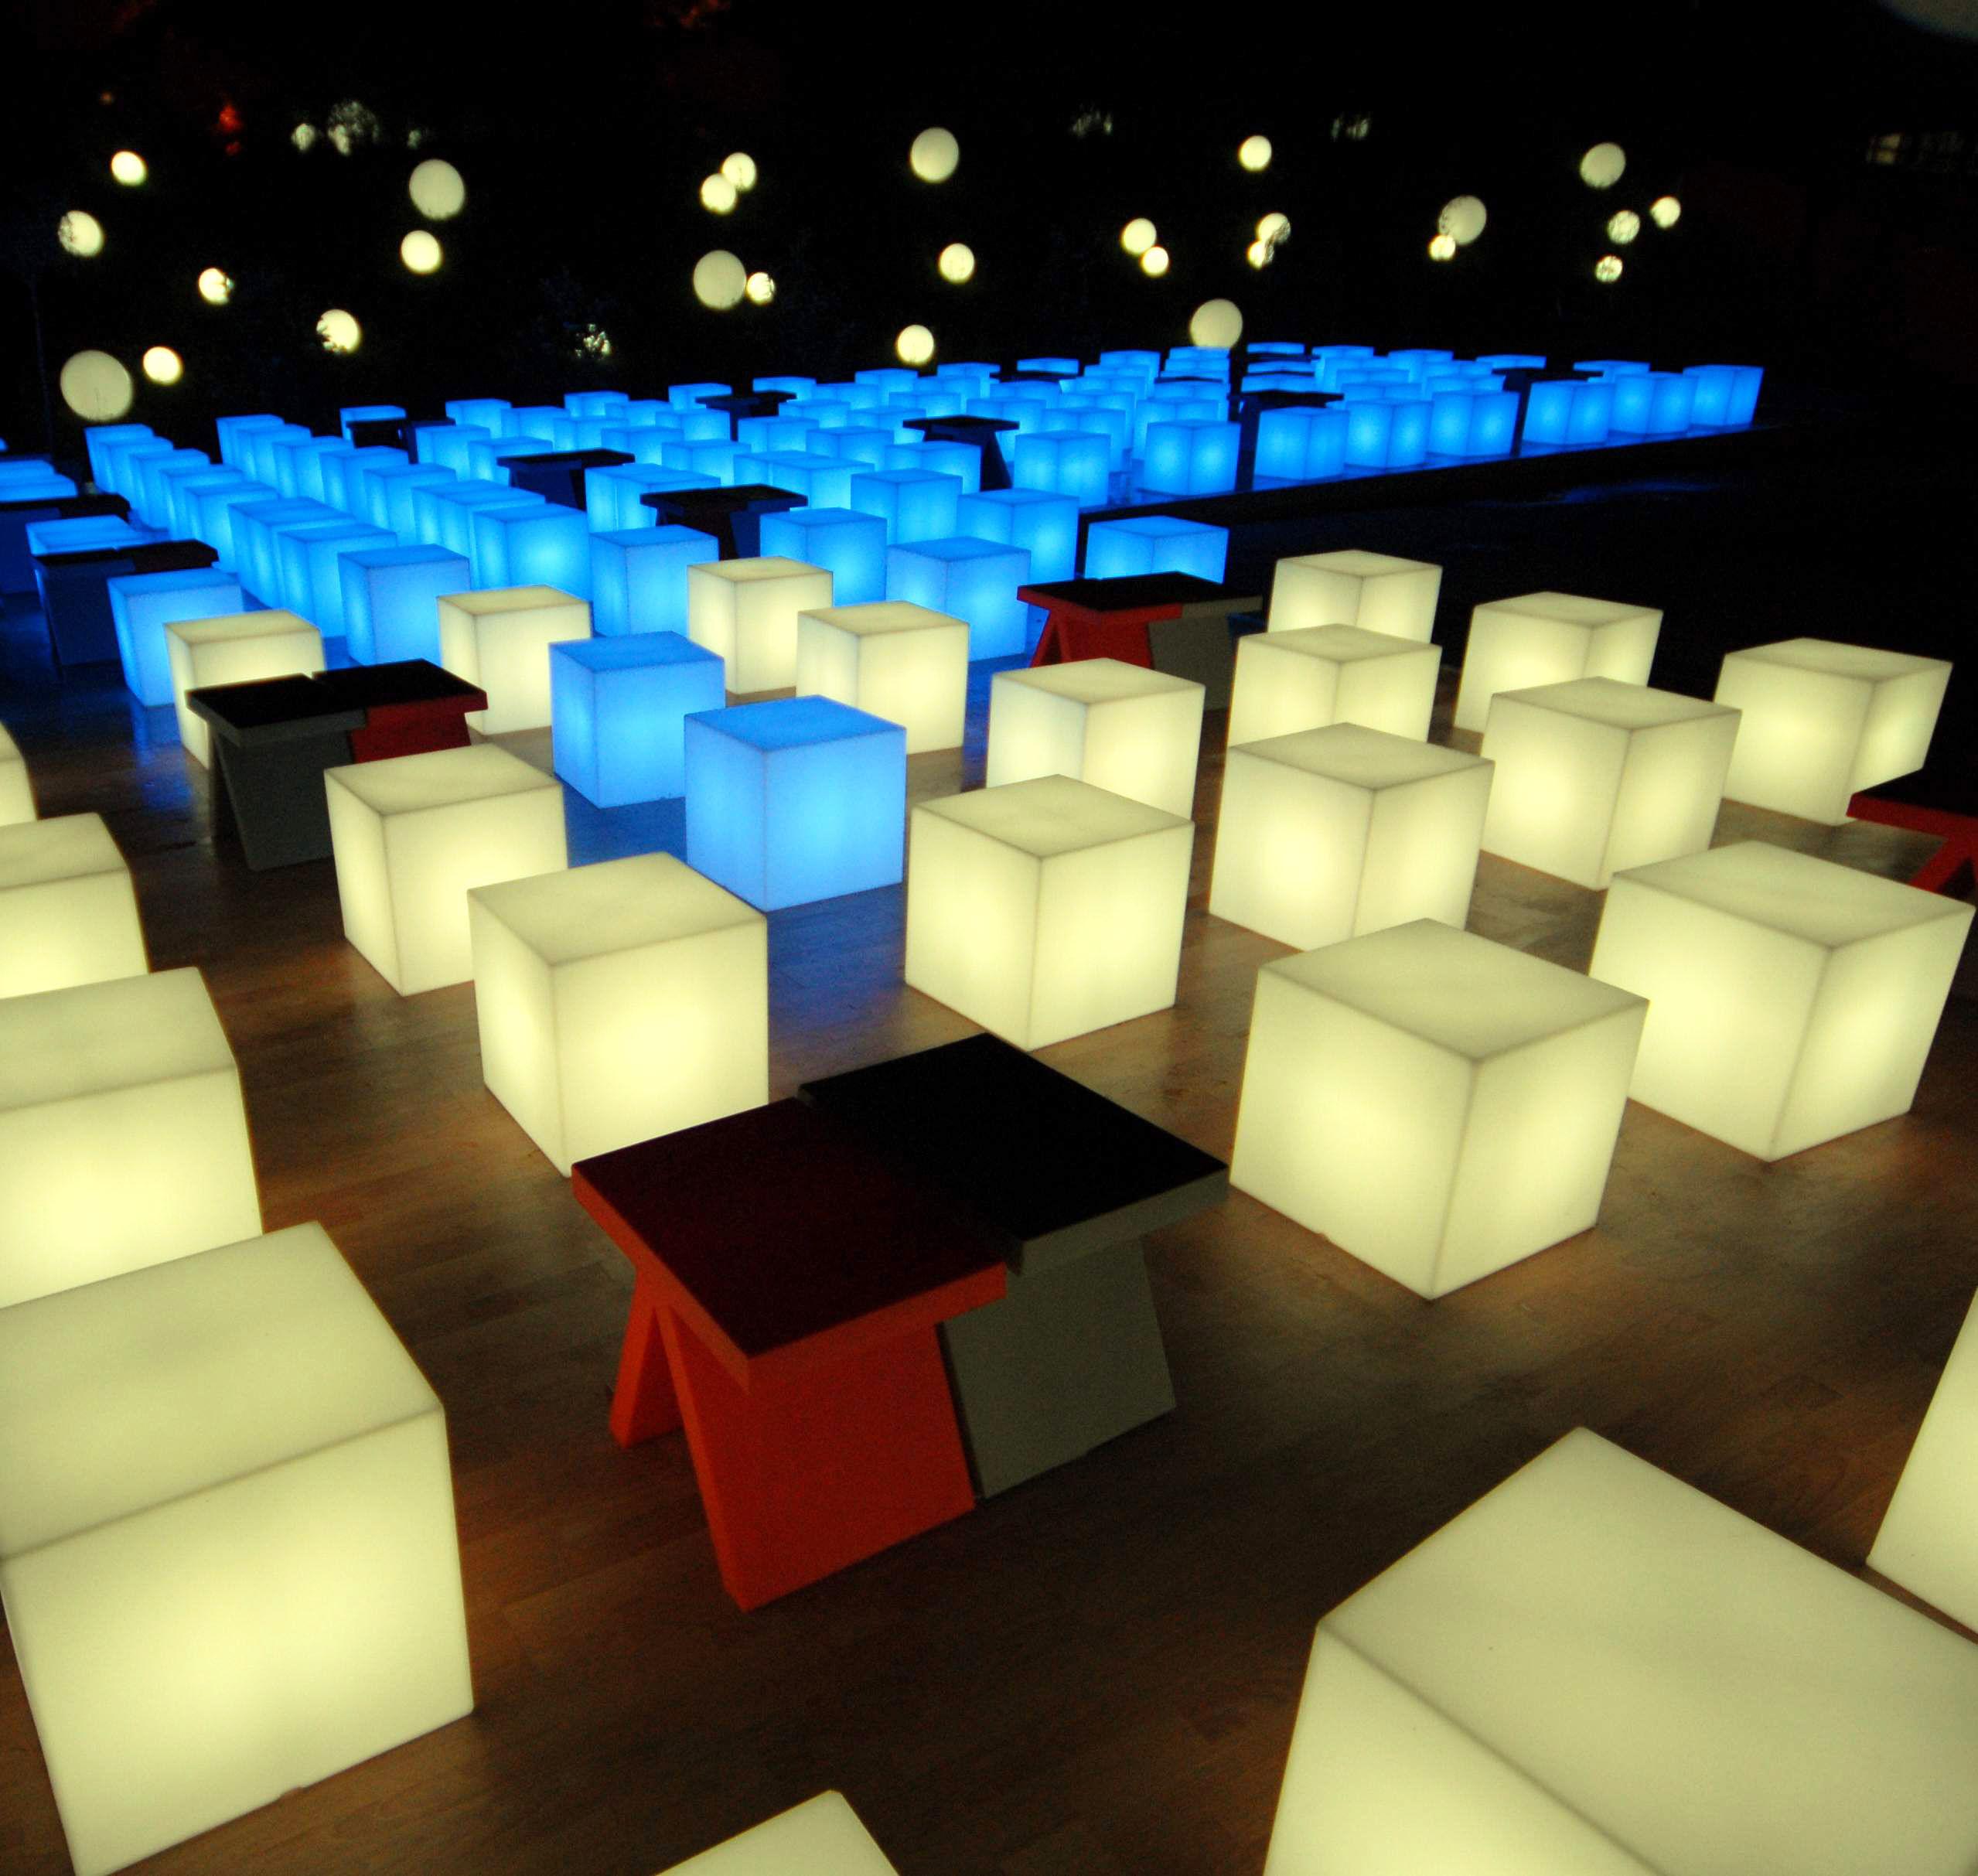 Cubo indoor luminous coffee table 43 cm with cable - Decoracion de pub ...